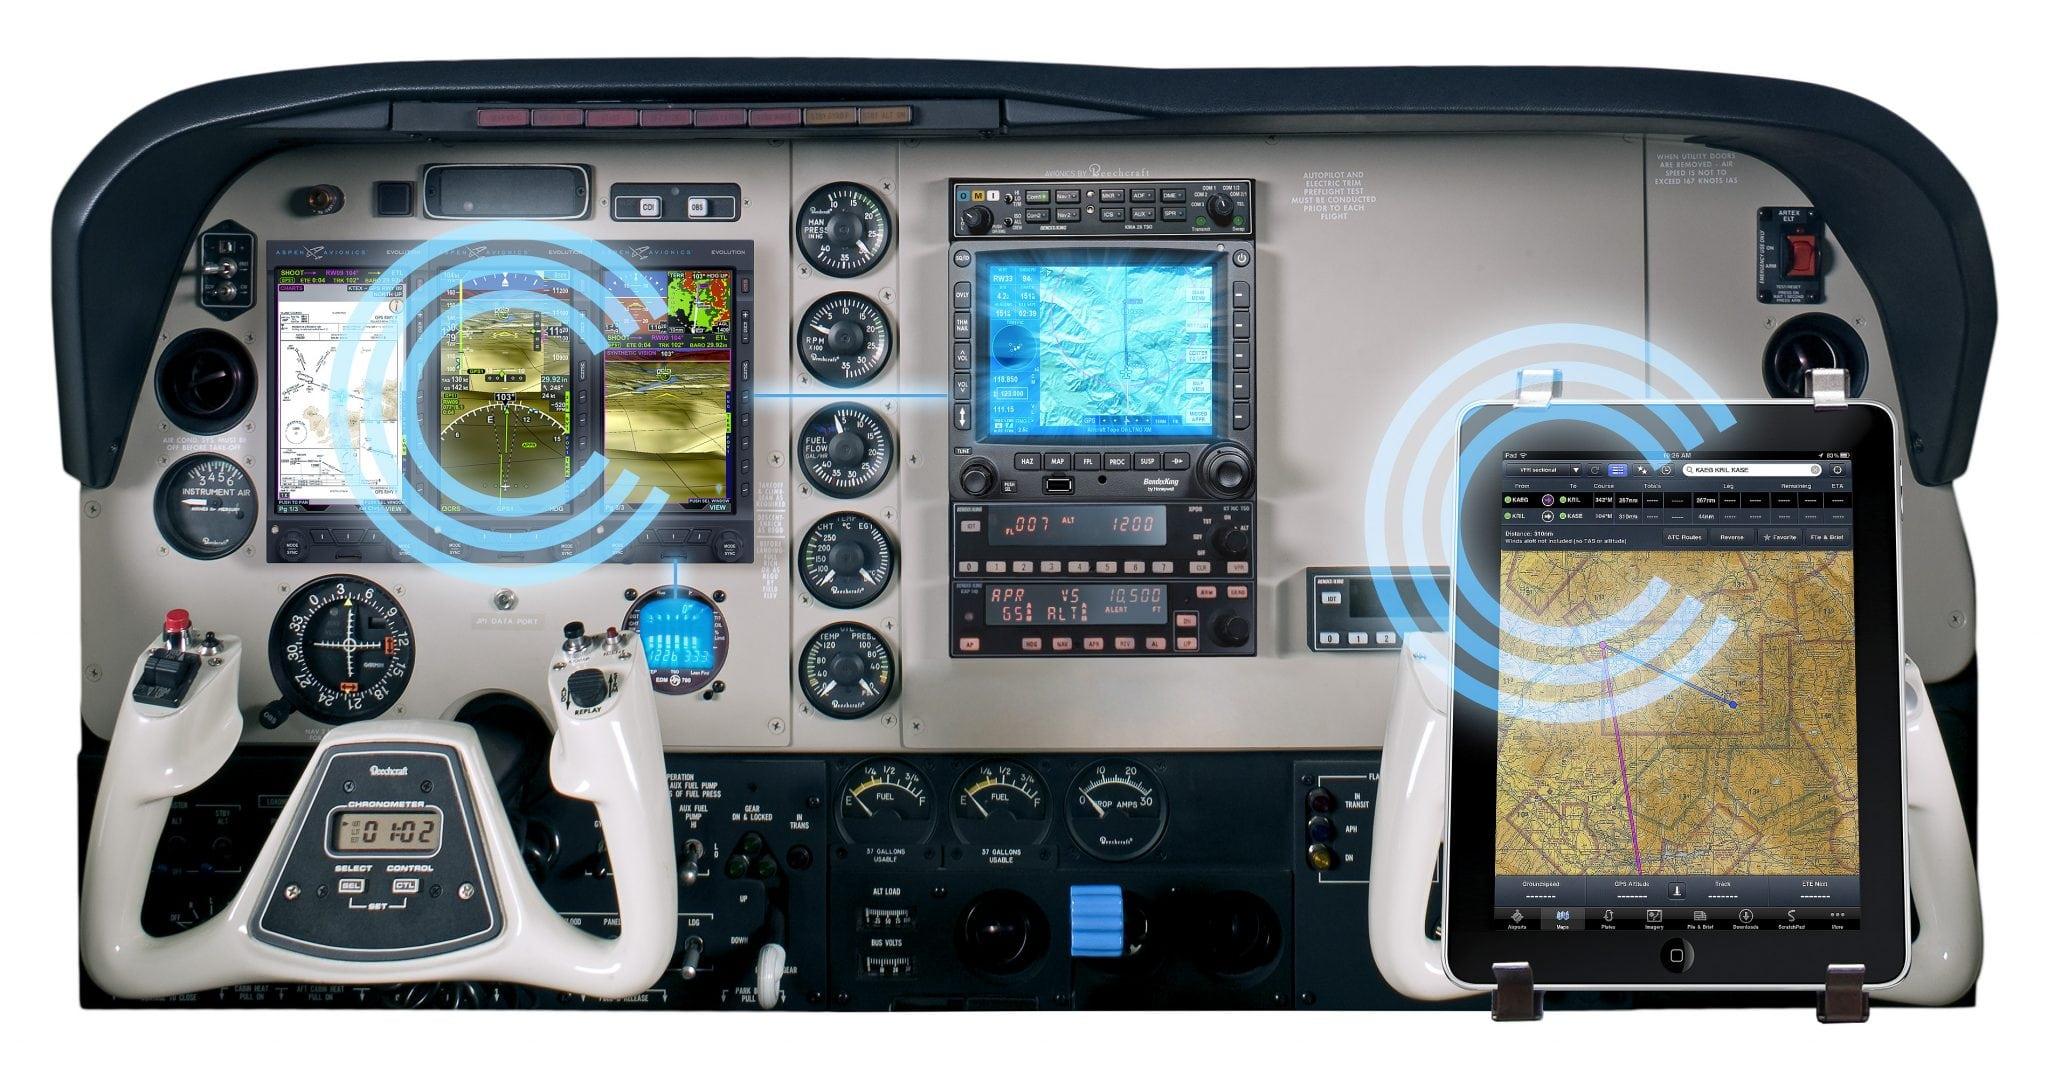 Aspen Avionics connected panel wireless cockpit system concept